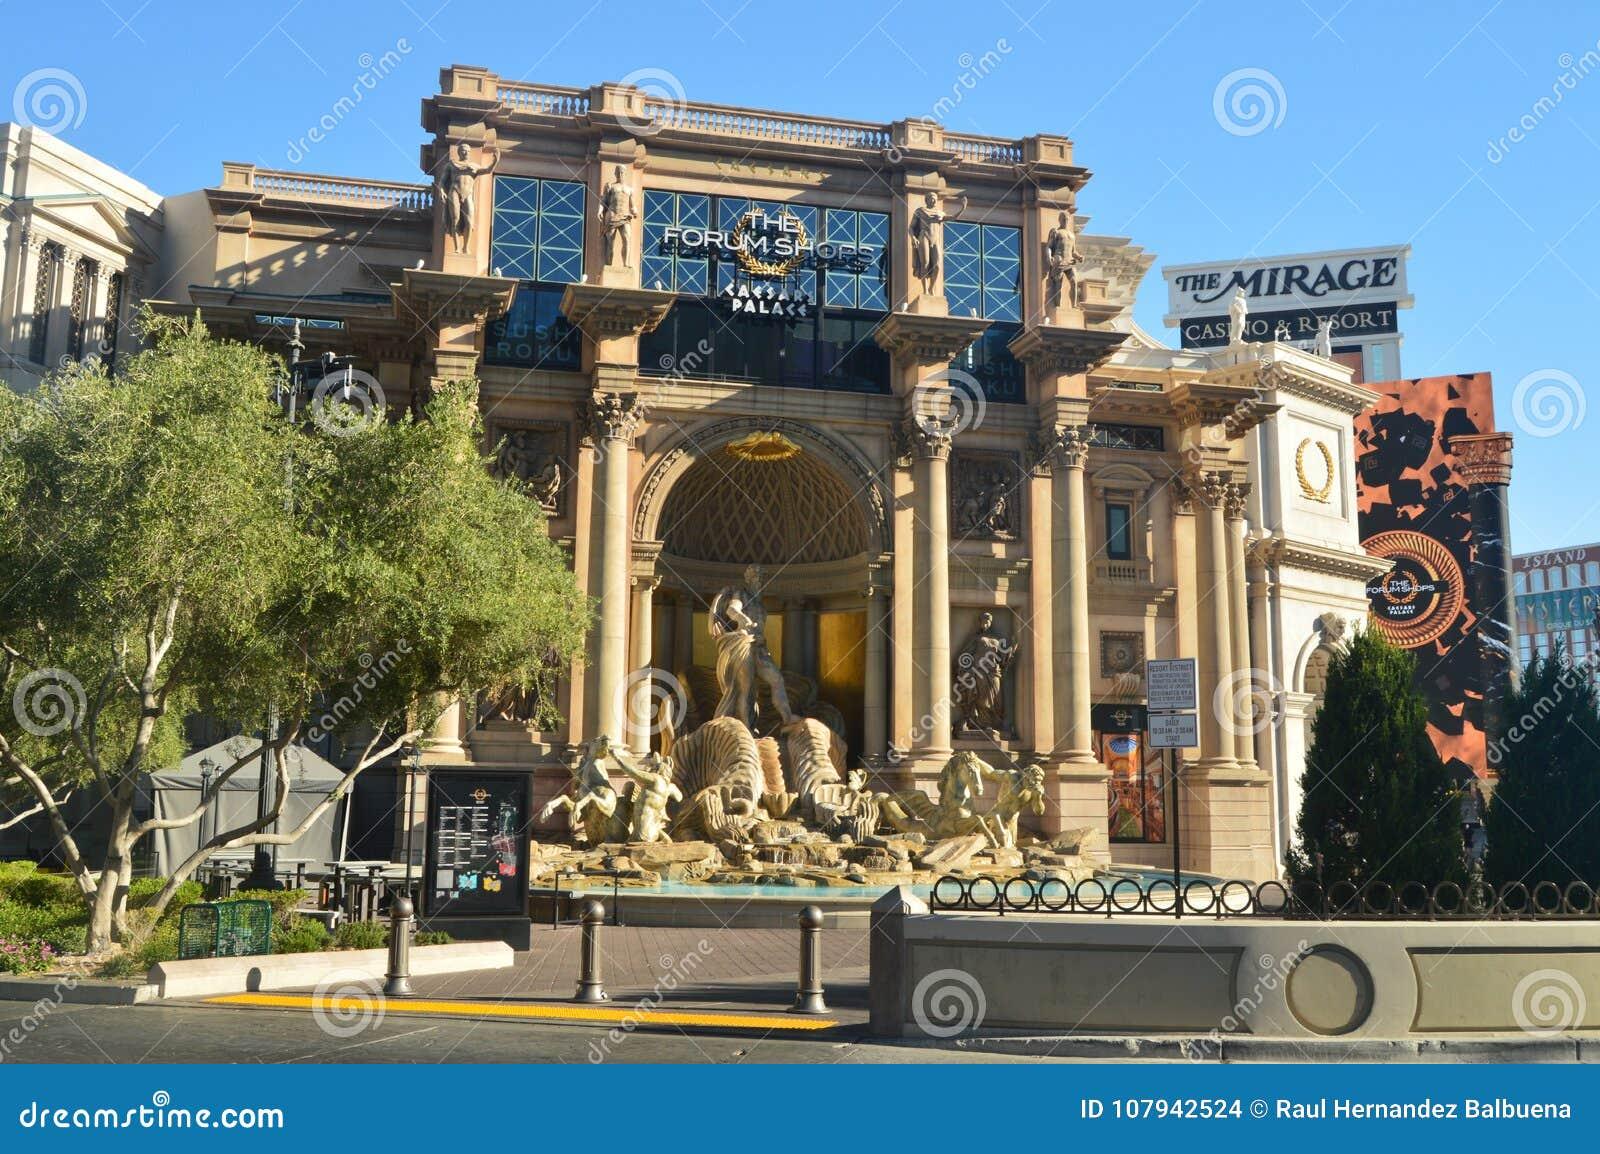 Beautiful Hotel Caesar Palace On The Las Vegas Strip. Travel Vacation